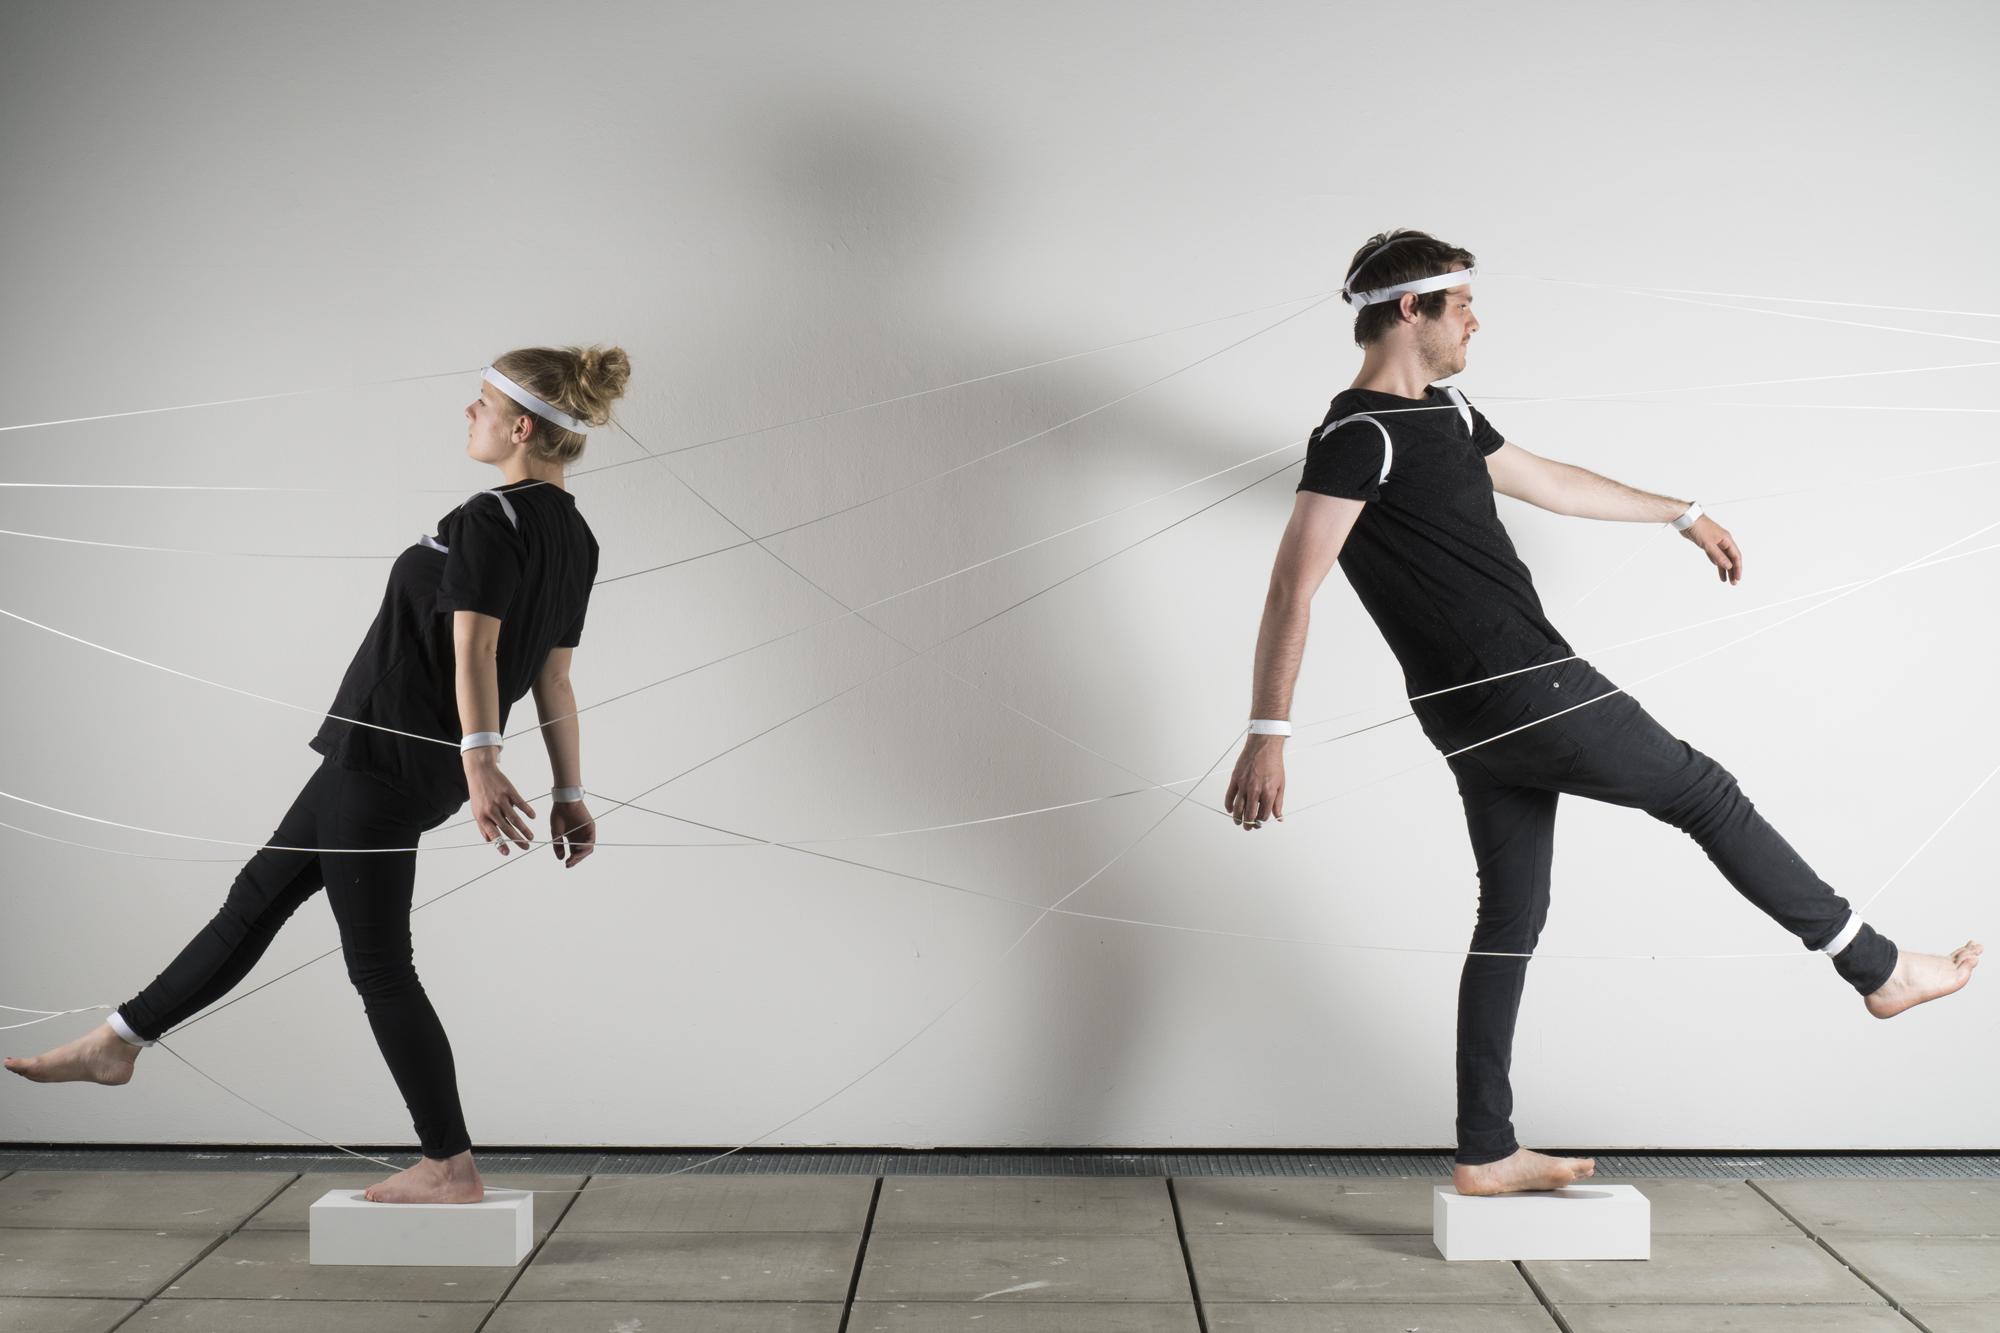 Phase 4 - Hybride - konfrontatives Experiment - Maskierung Autoren: Laura Lehle & Michael Varga Photo: J. Cafuk / Y. Kaiser